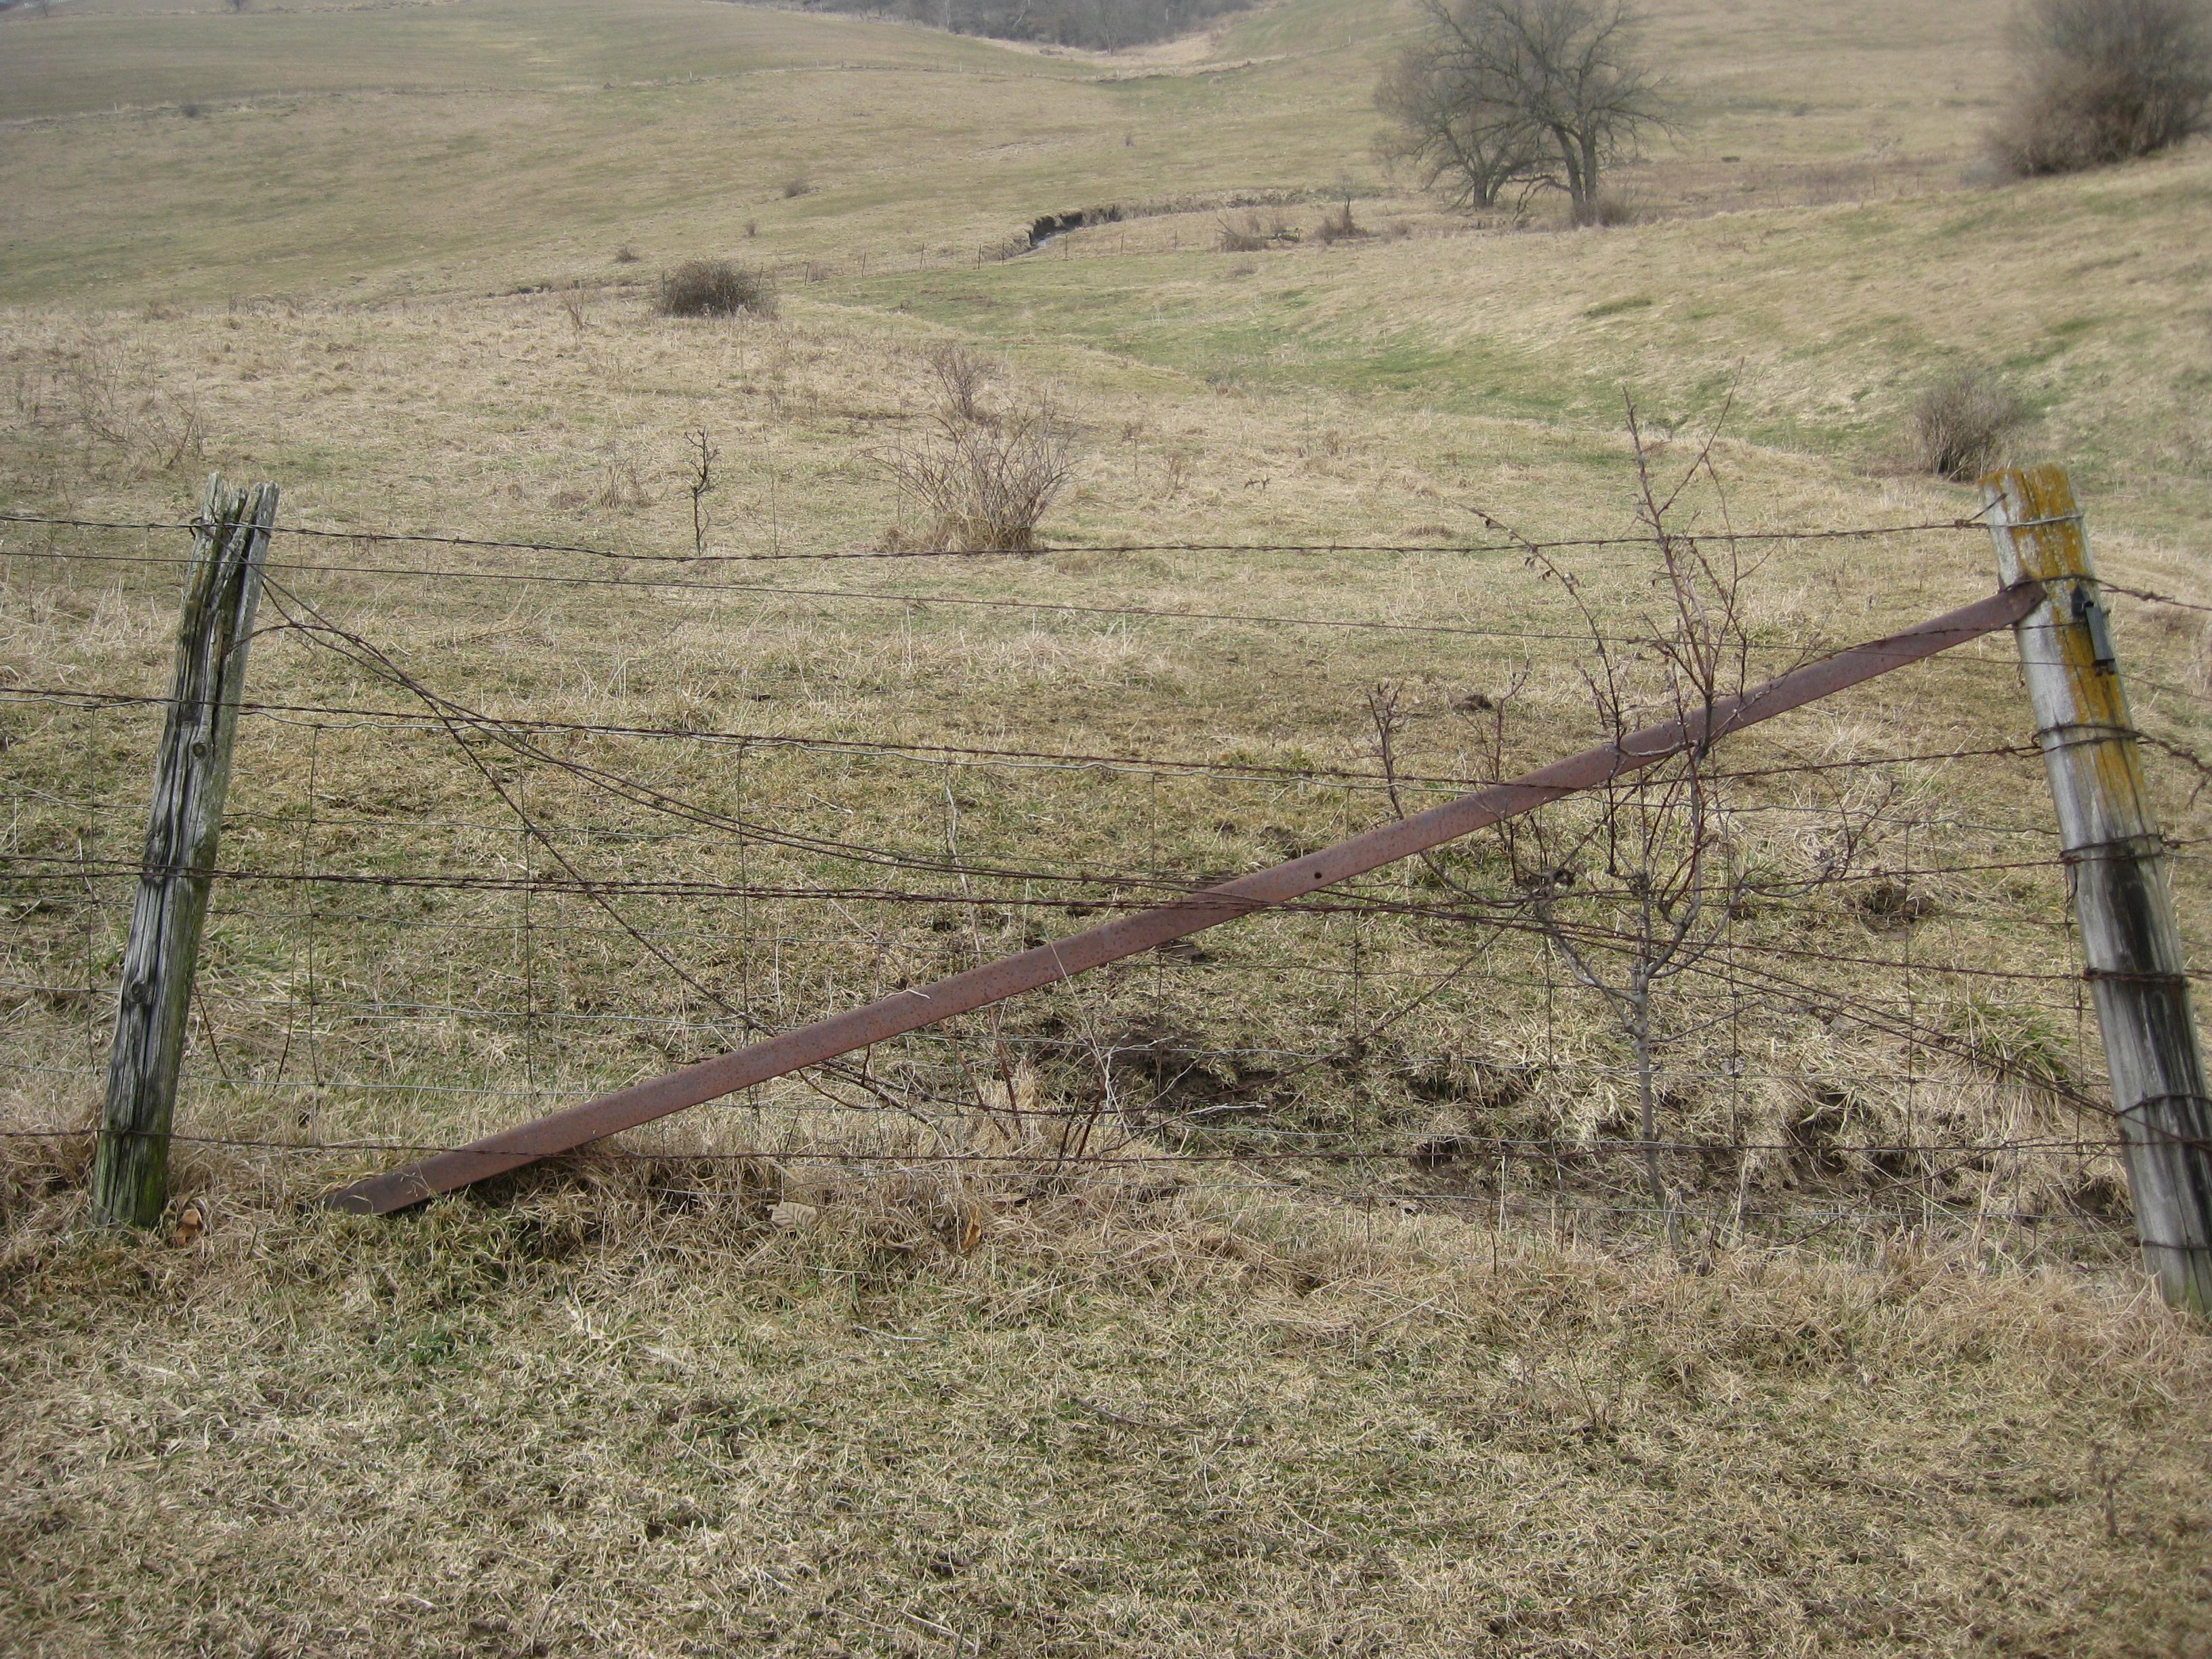 Tearing out fence curiousfarmer